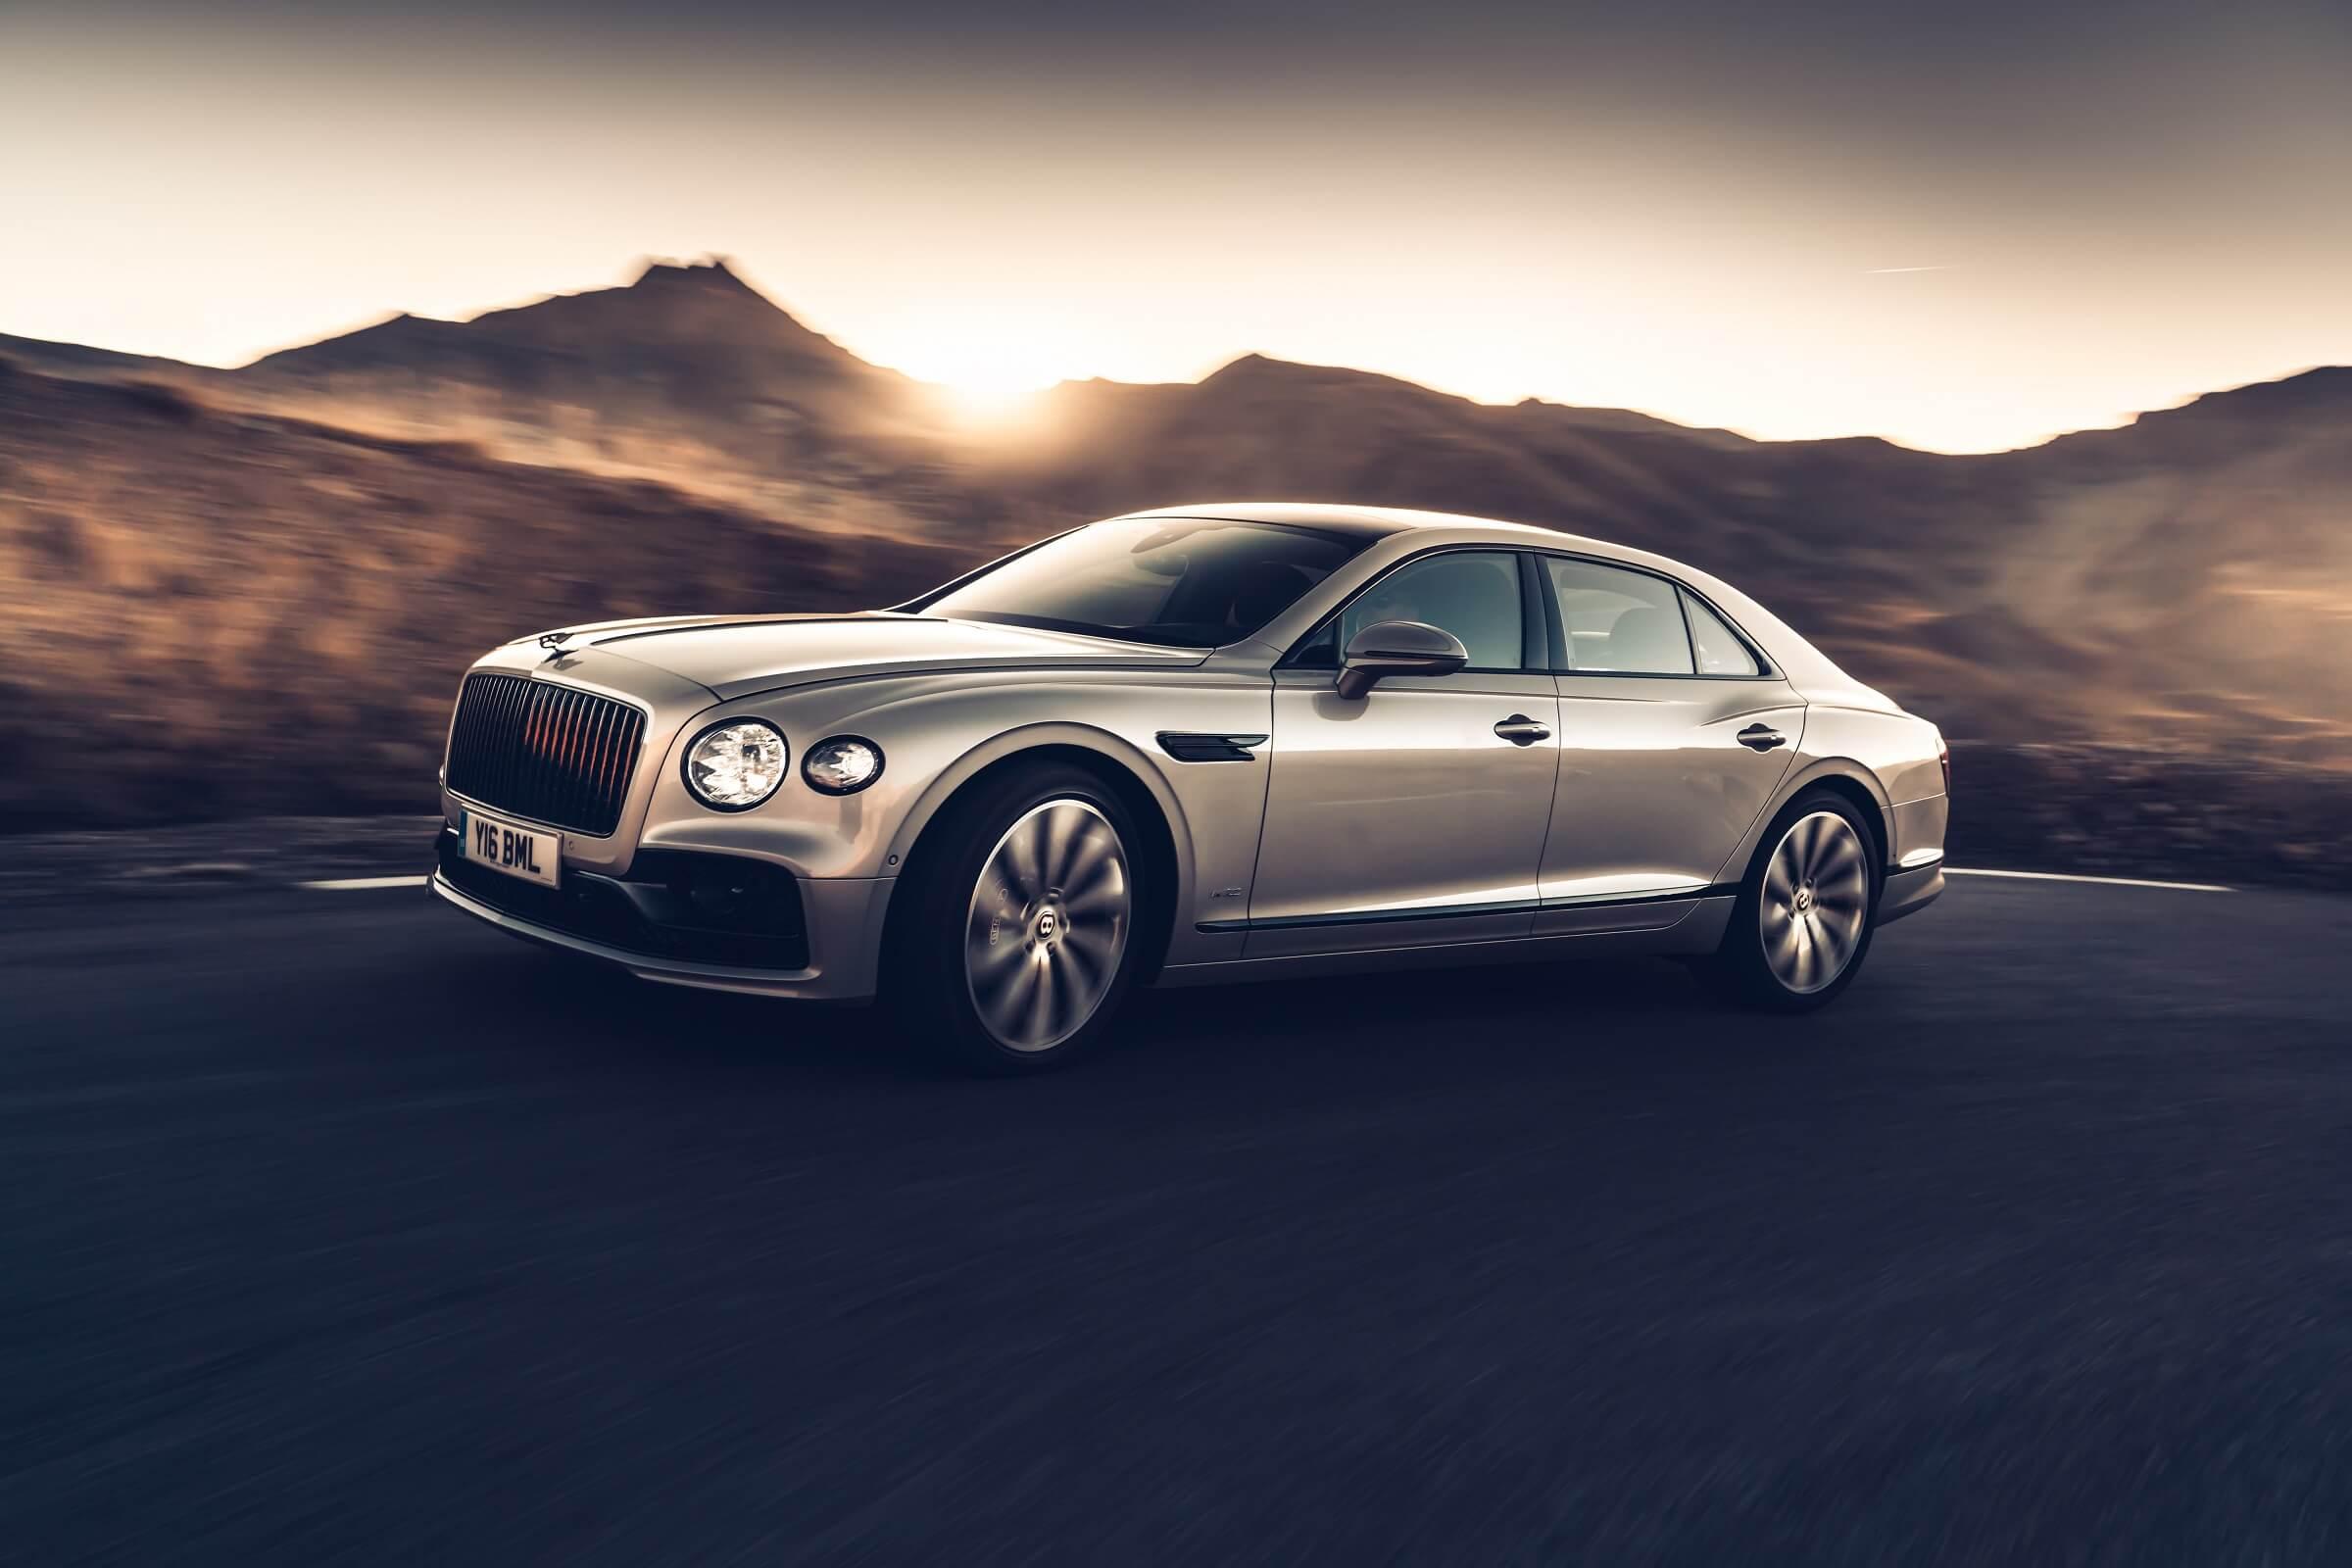 Bentley - Metrology - Flying Spur